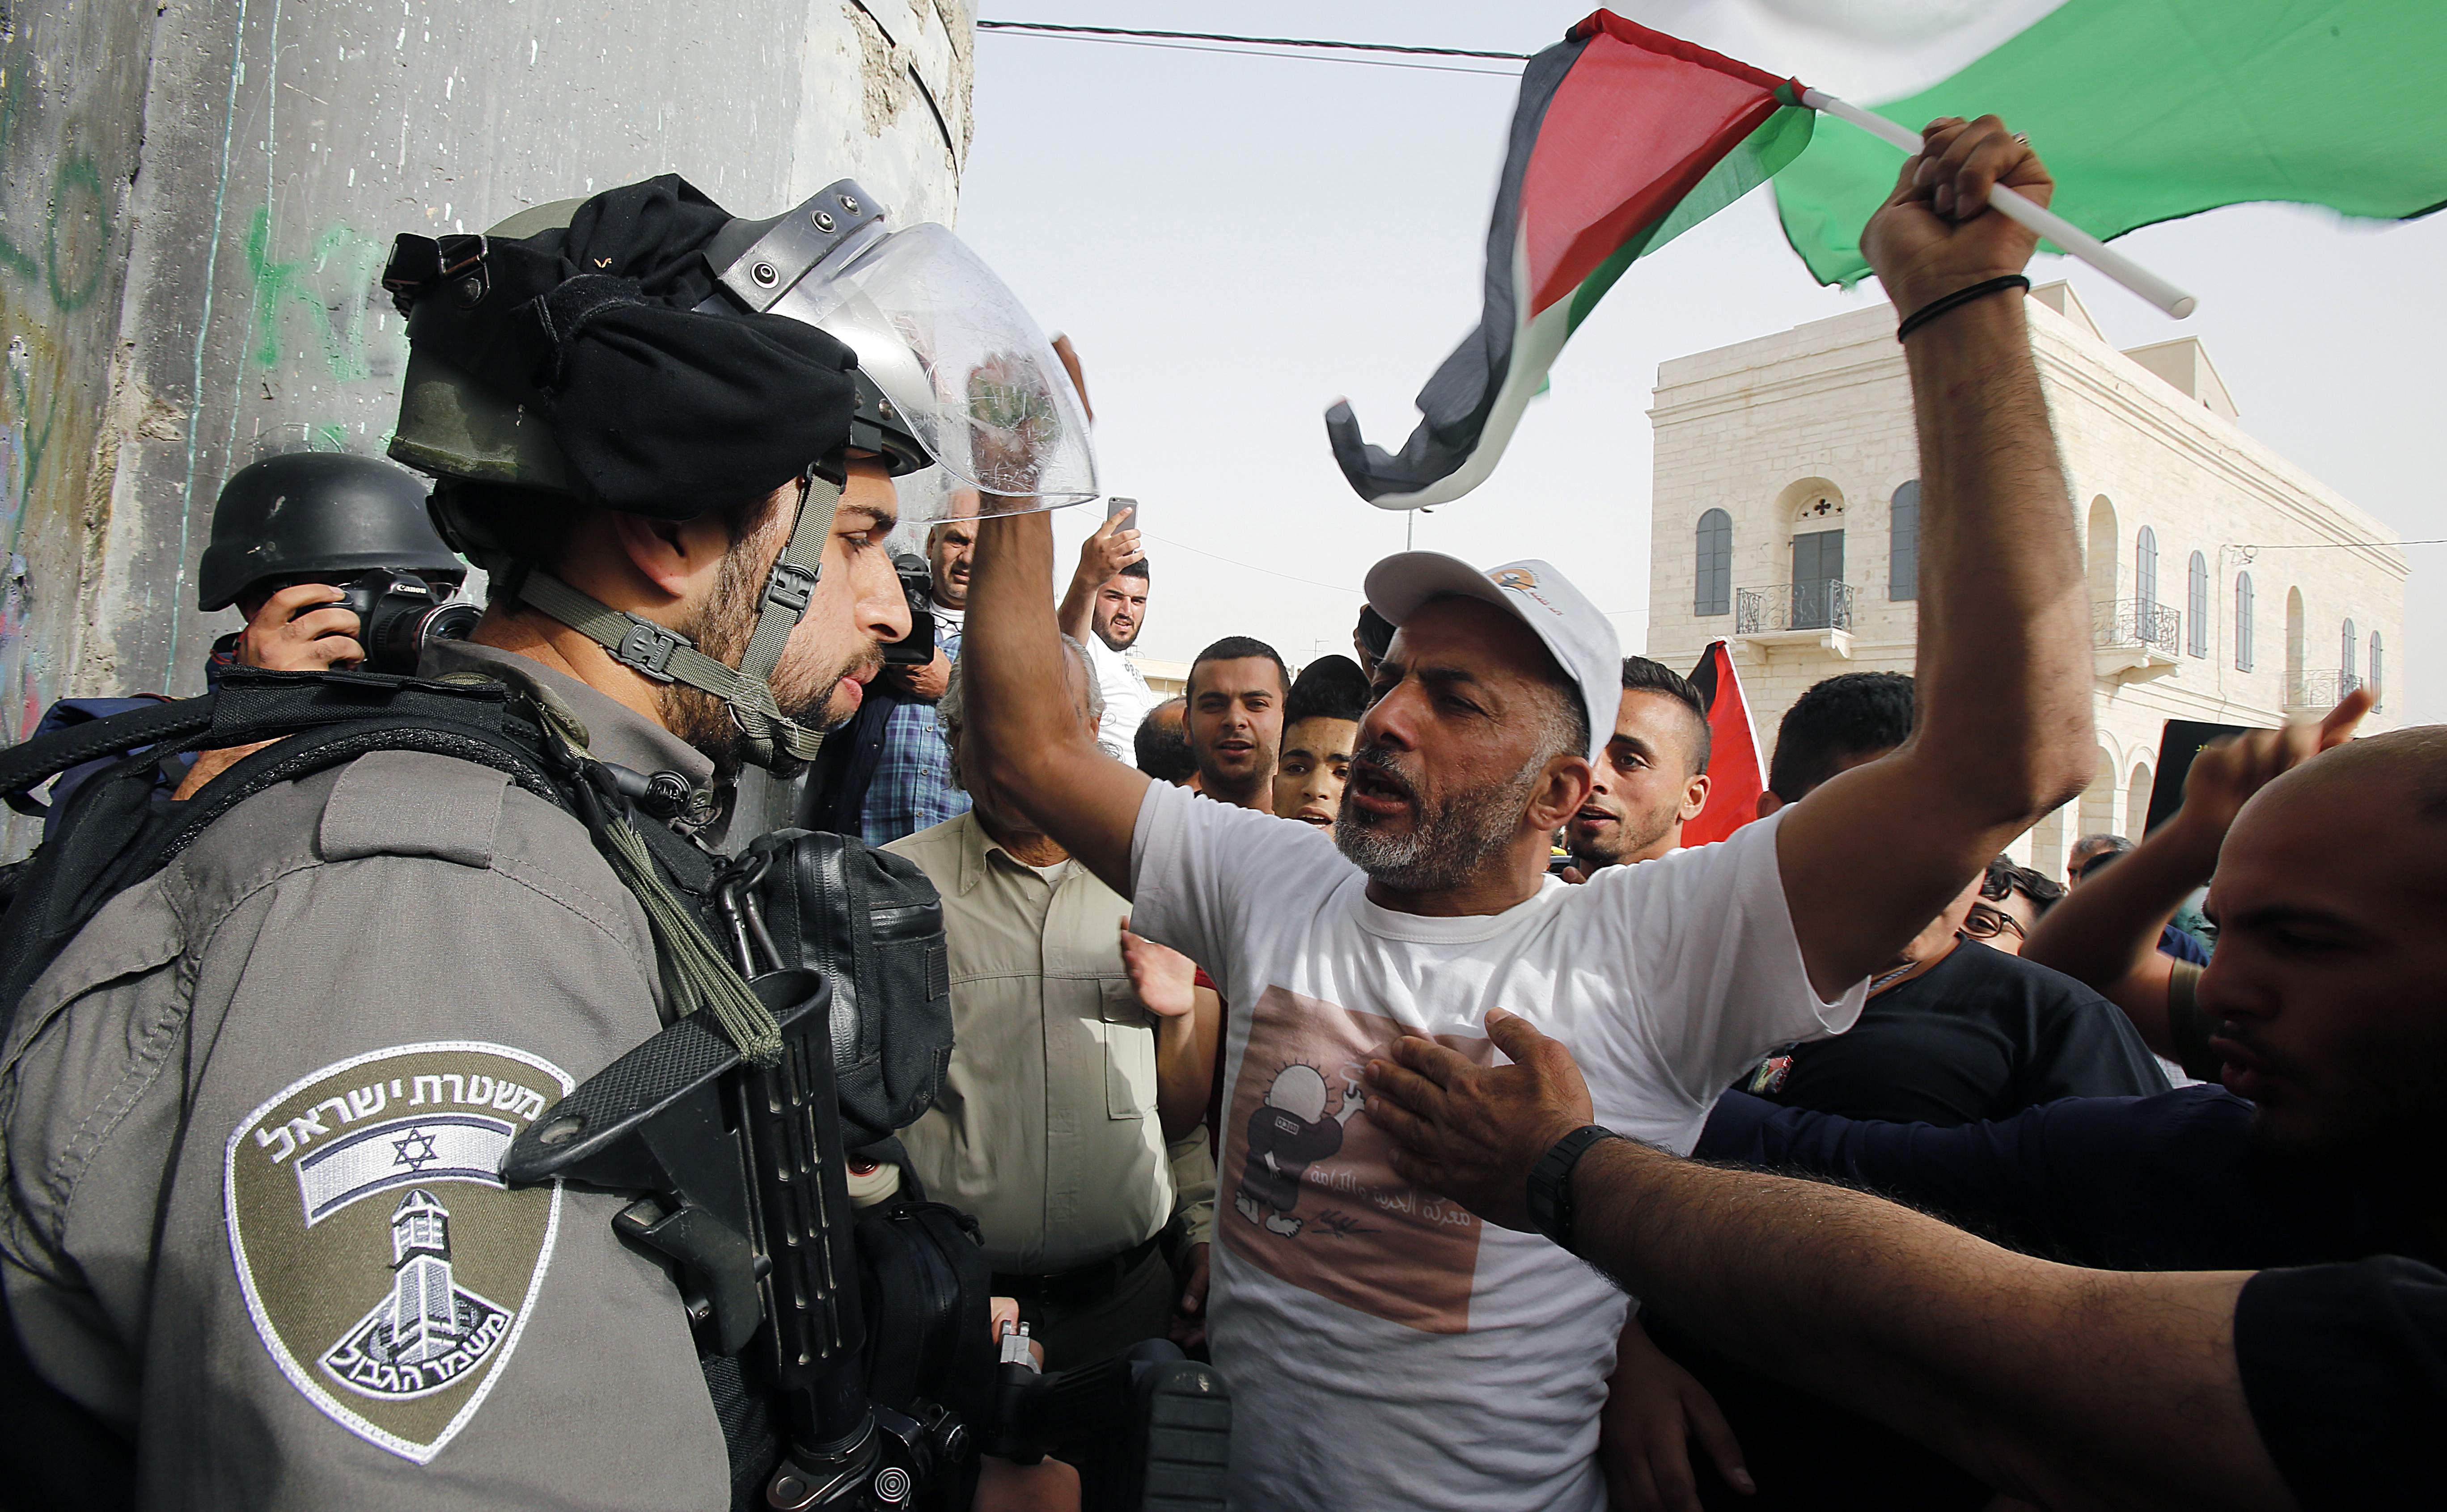 PALESTINIAN-ISRAEL-CONFLICT-PRISONERS